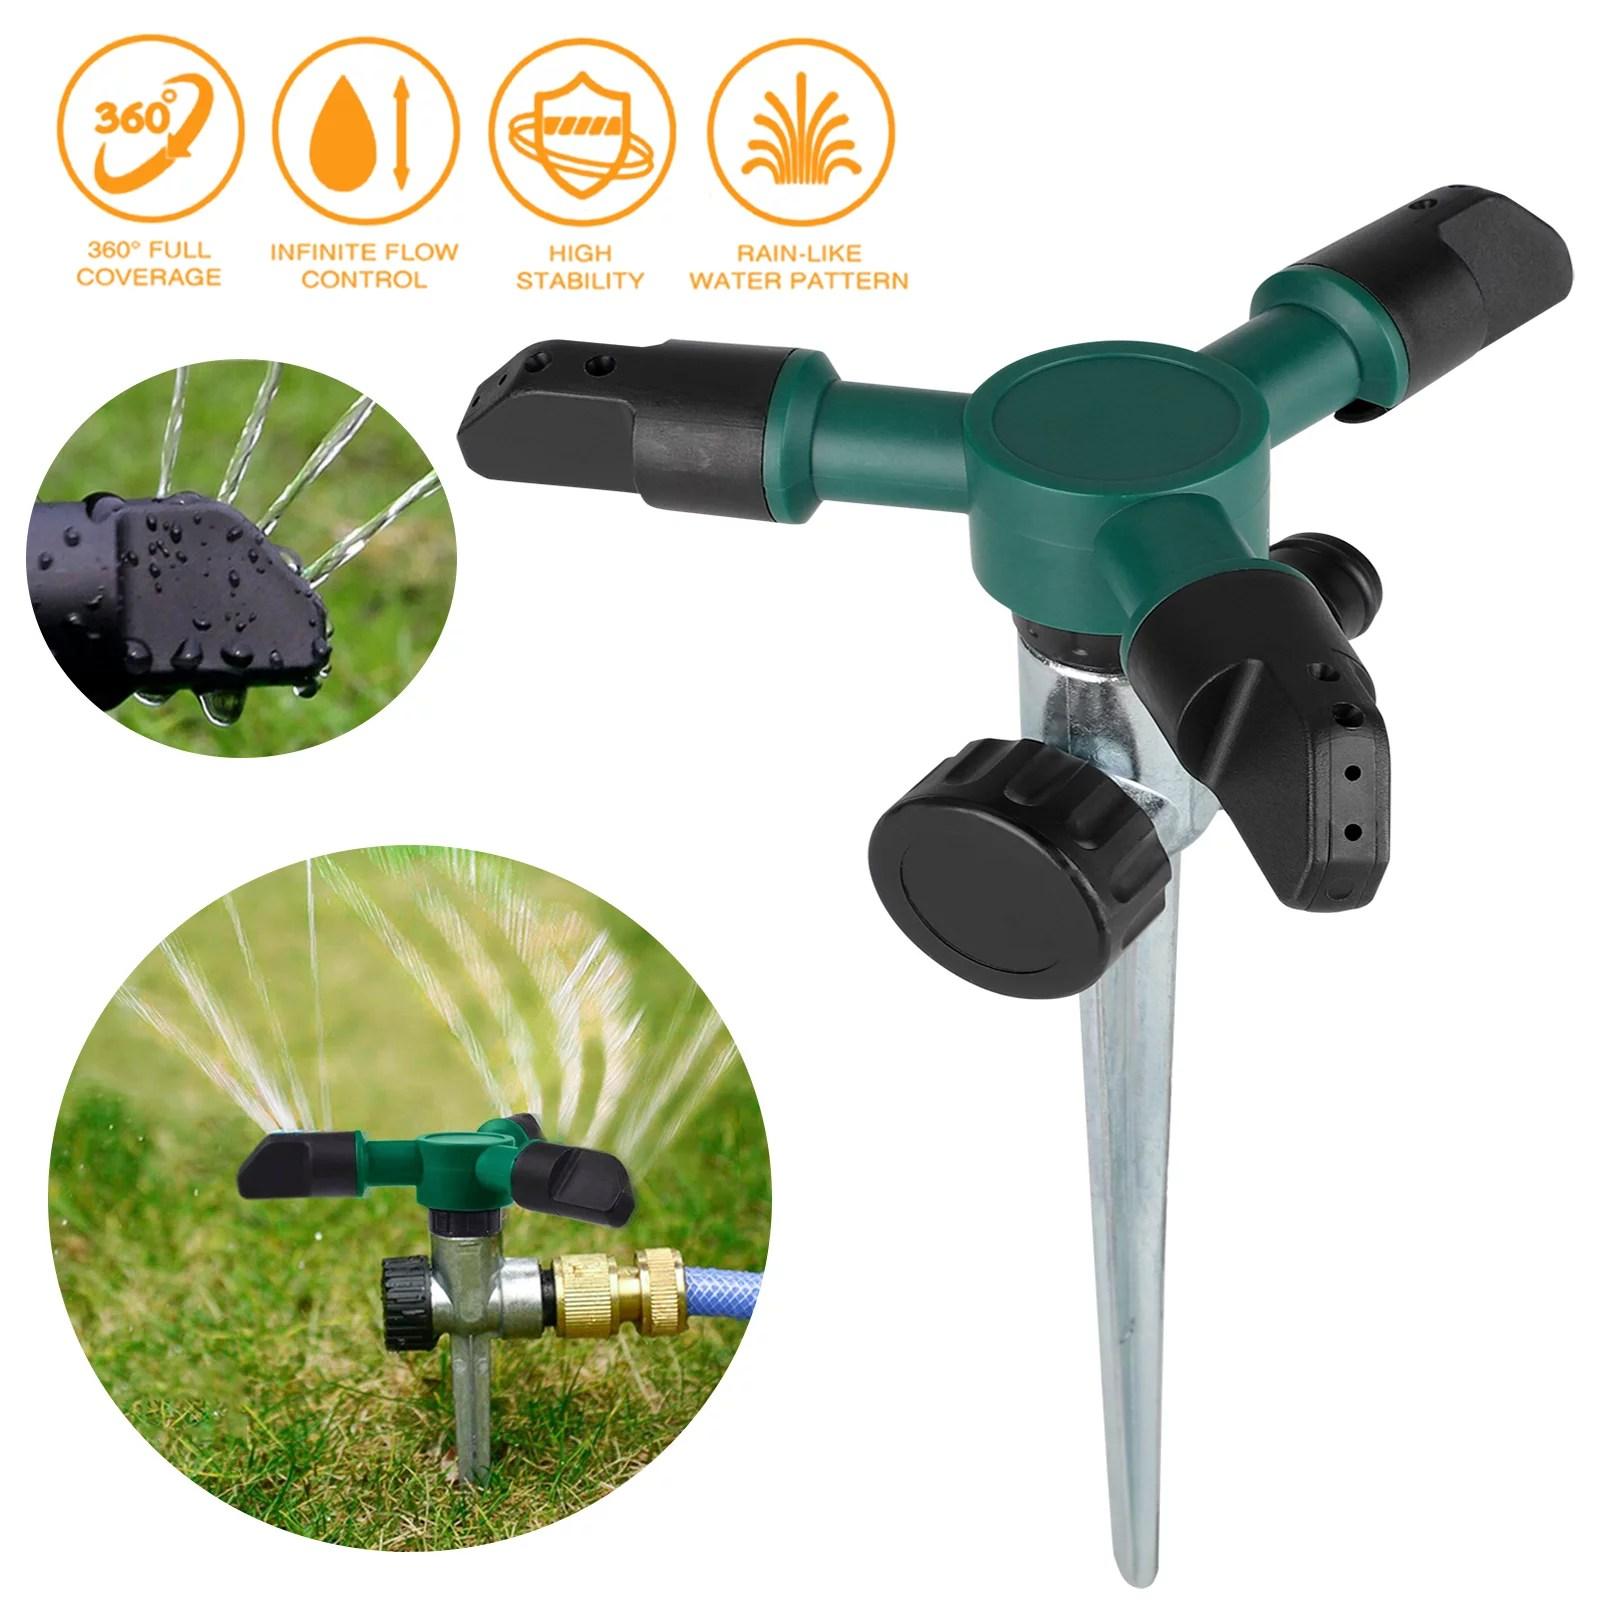 Lawn Sprinkler Automatic 360 Degree Rotating Garden